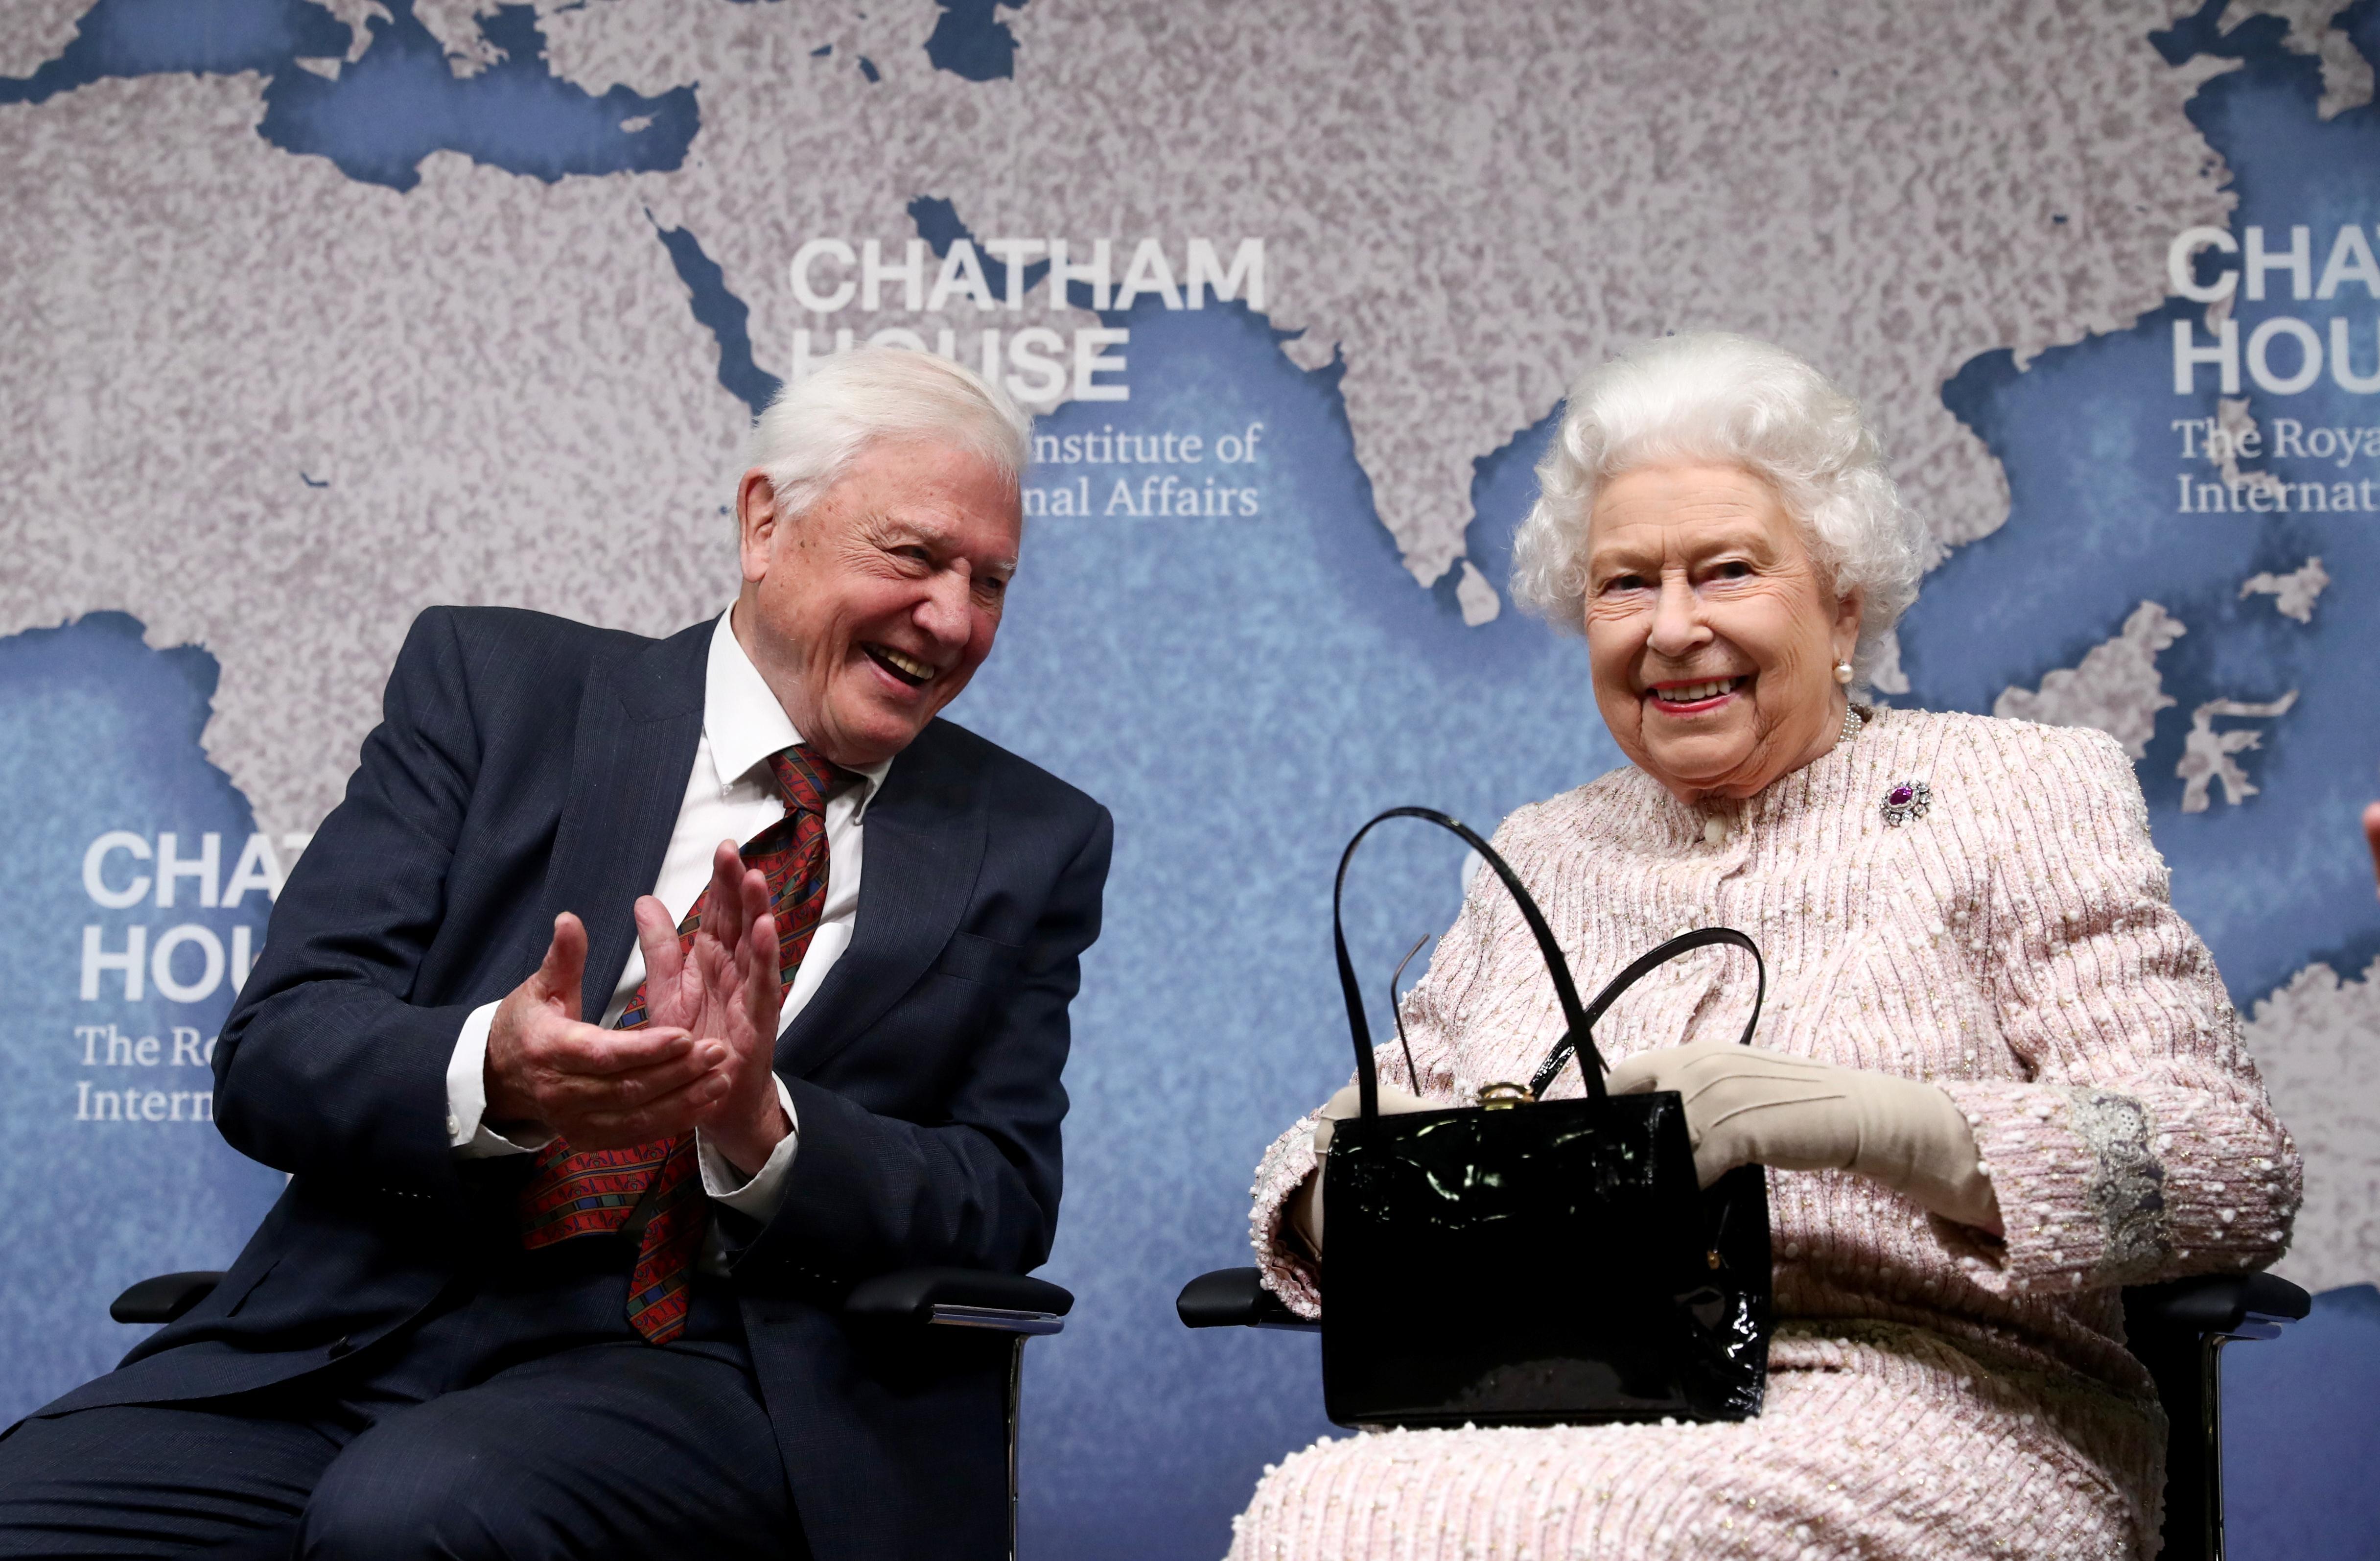 Queen Elizabeth presents naturalist Attenborough with award for...